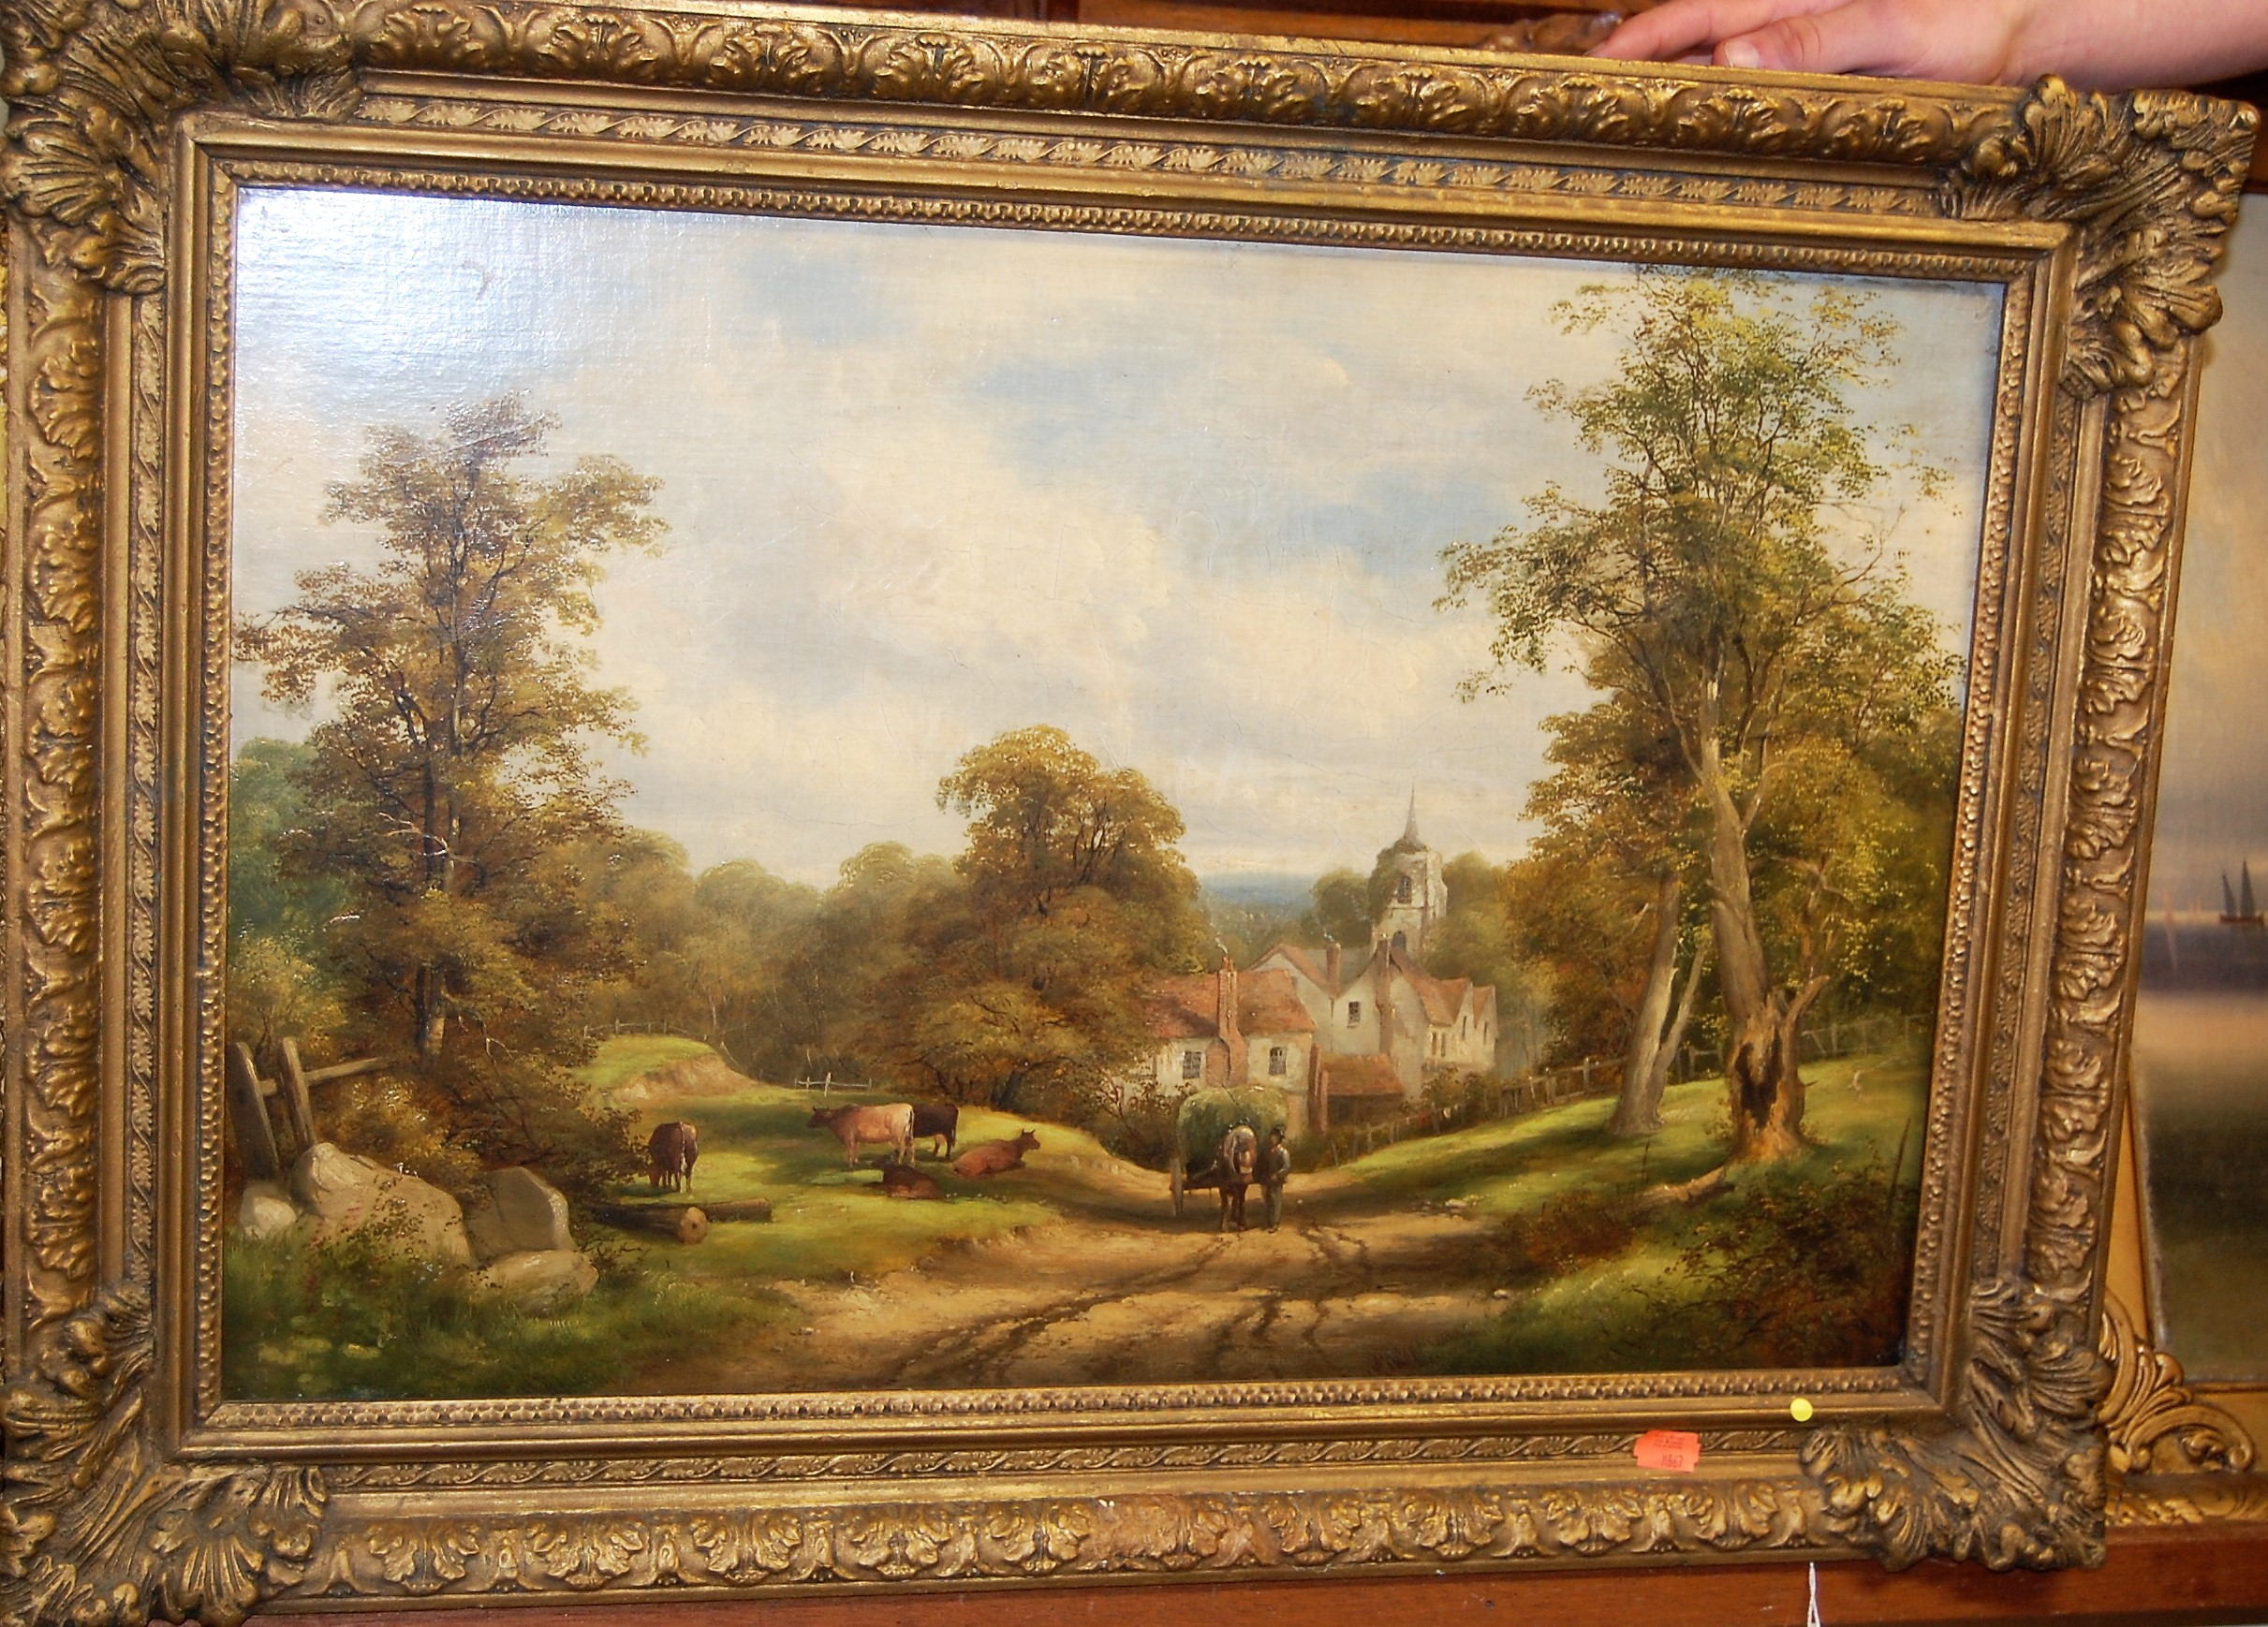 Lot 1007 - Circa 1900 English school - Haycart in a rural landscape, oil on canvas, 39 x 59cm